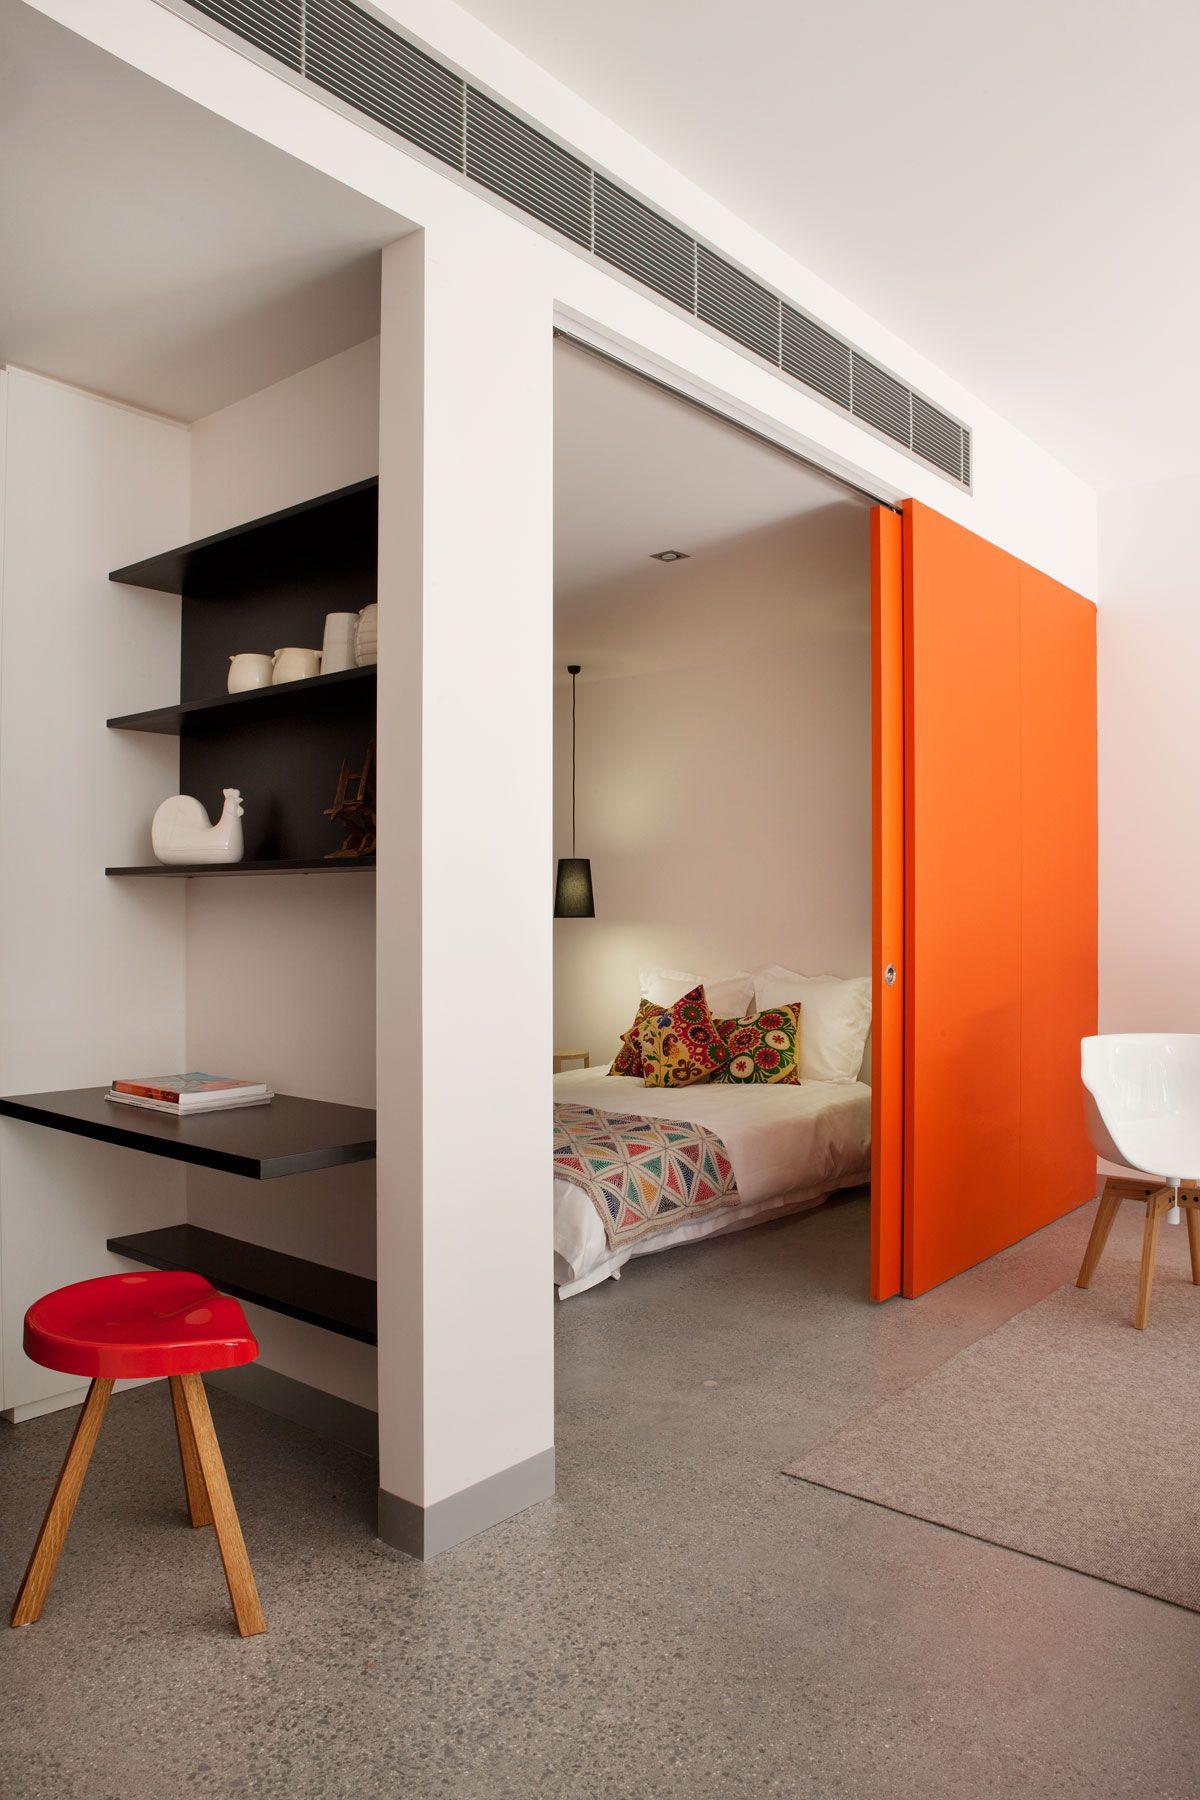 Loft bedroom privacy ideas  Interior design by Neometro Developments  ke the privacy door